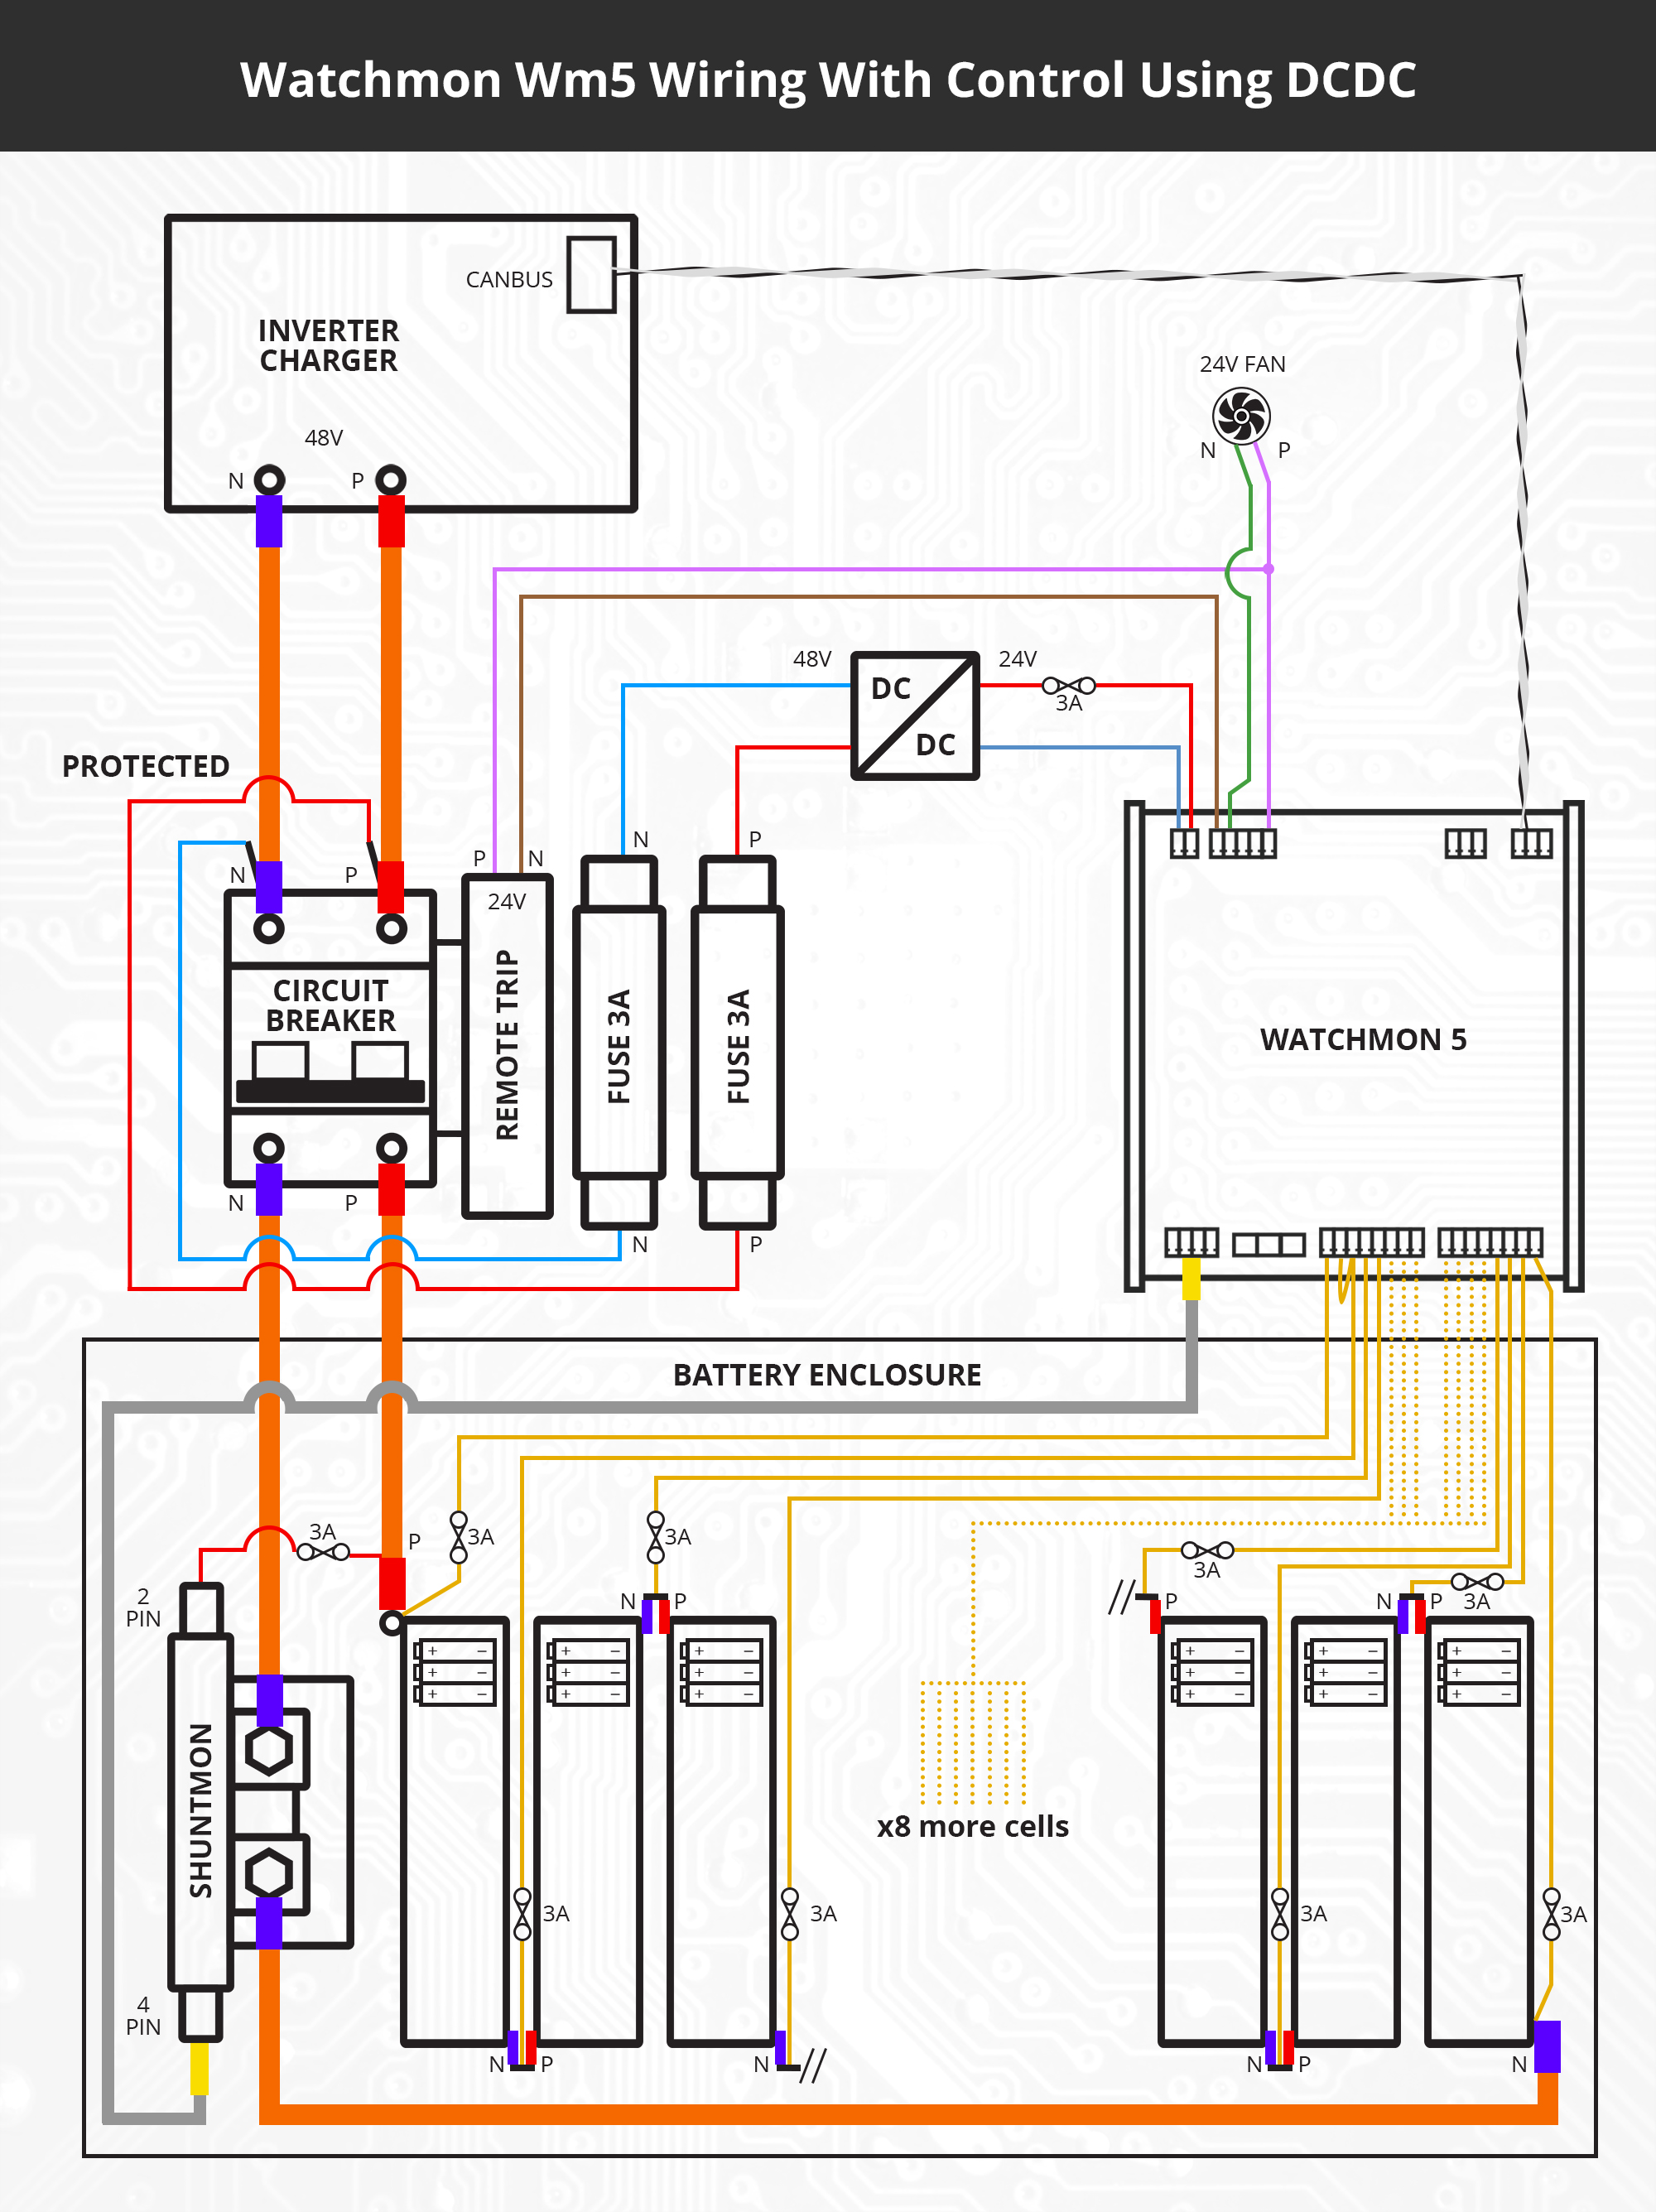 Typical Wiring Diagrams - WatchMonPlus WM5 - Batrium Knowledge BaseSupport - Batrium